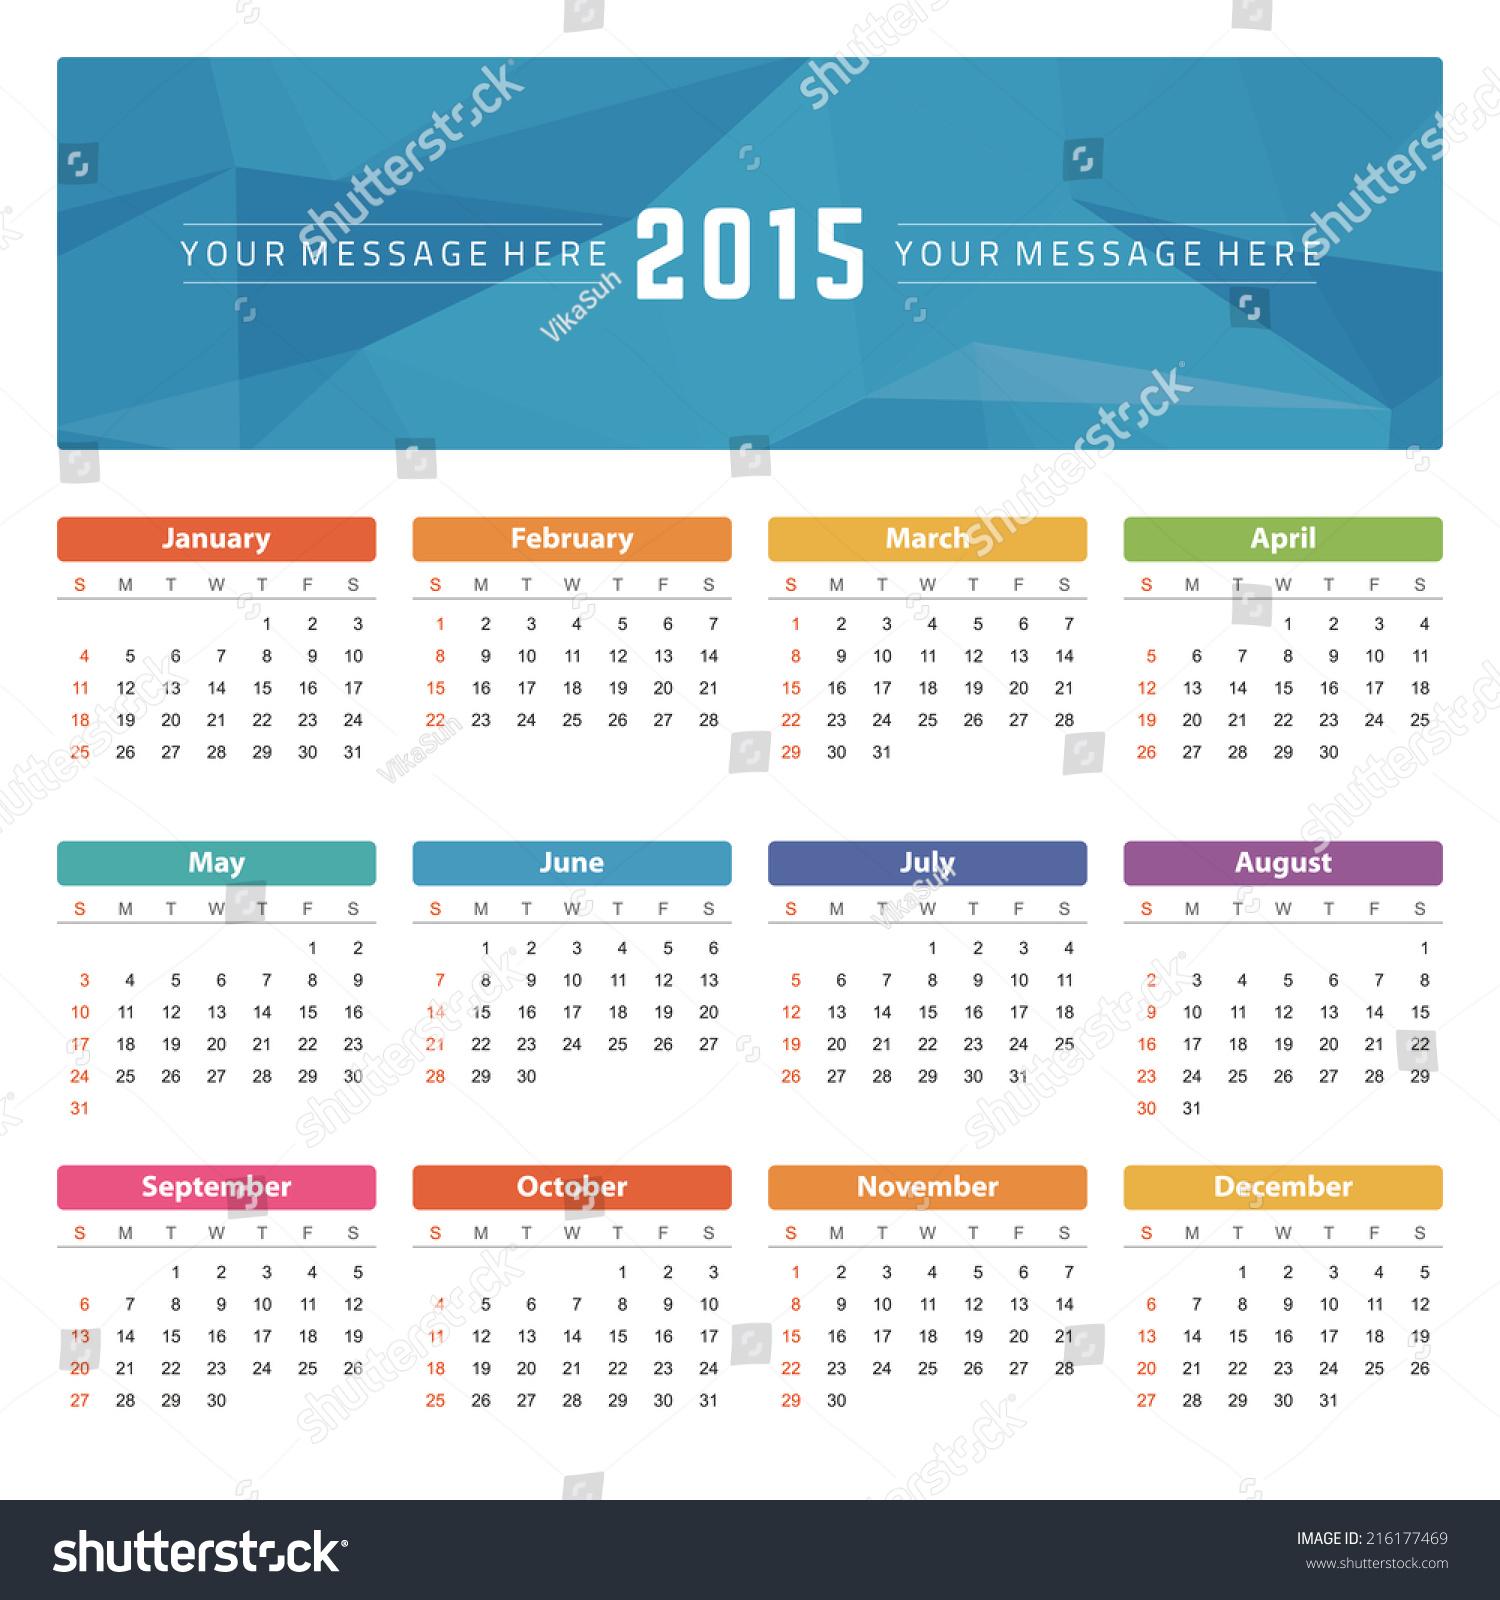 Kumpulan Calendar 2015 Year Vector Design Template Stock Photo - Gambaradakata.com - Gambaradakata.com